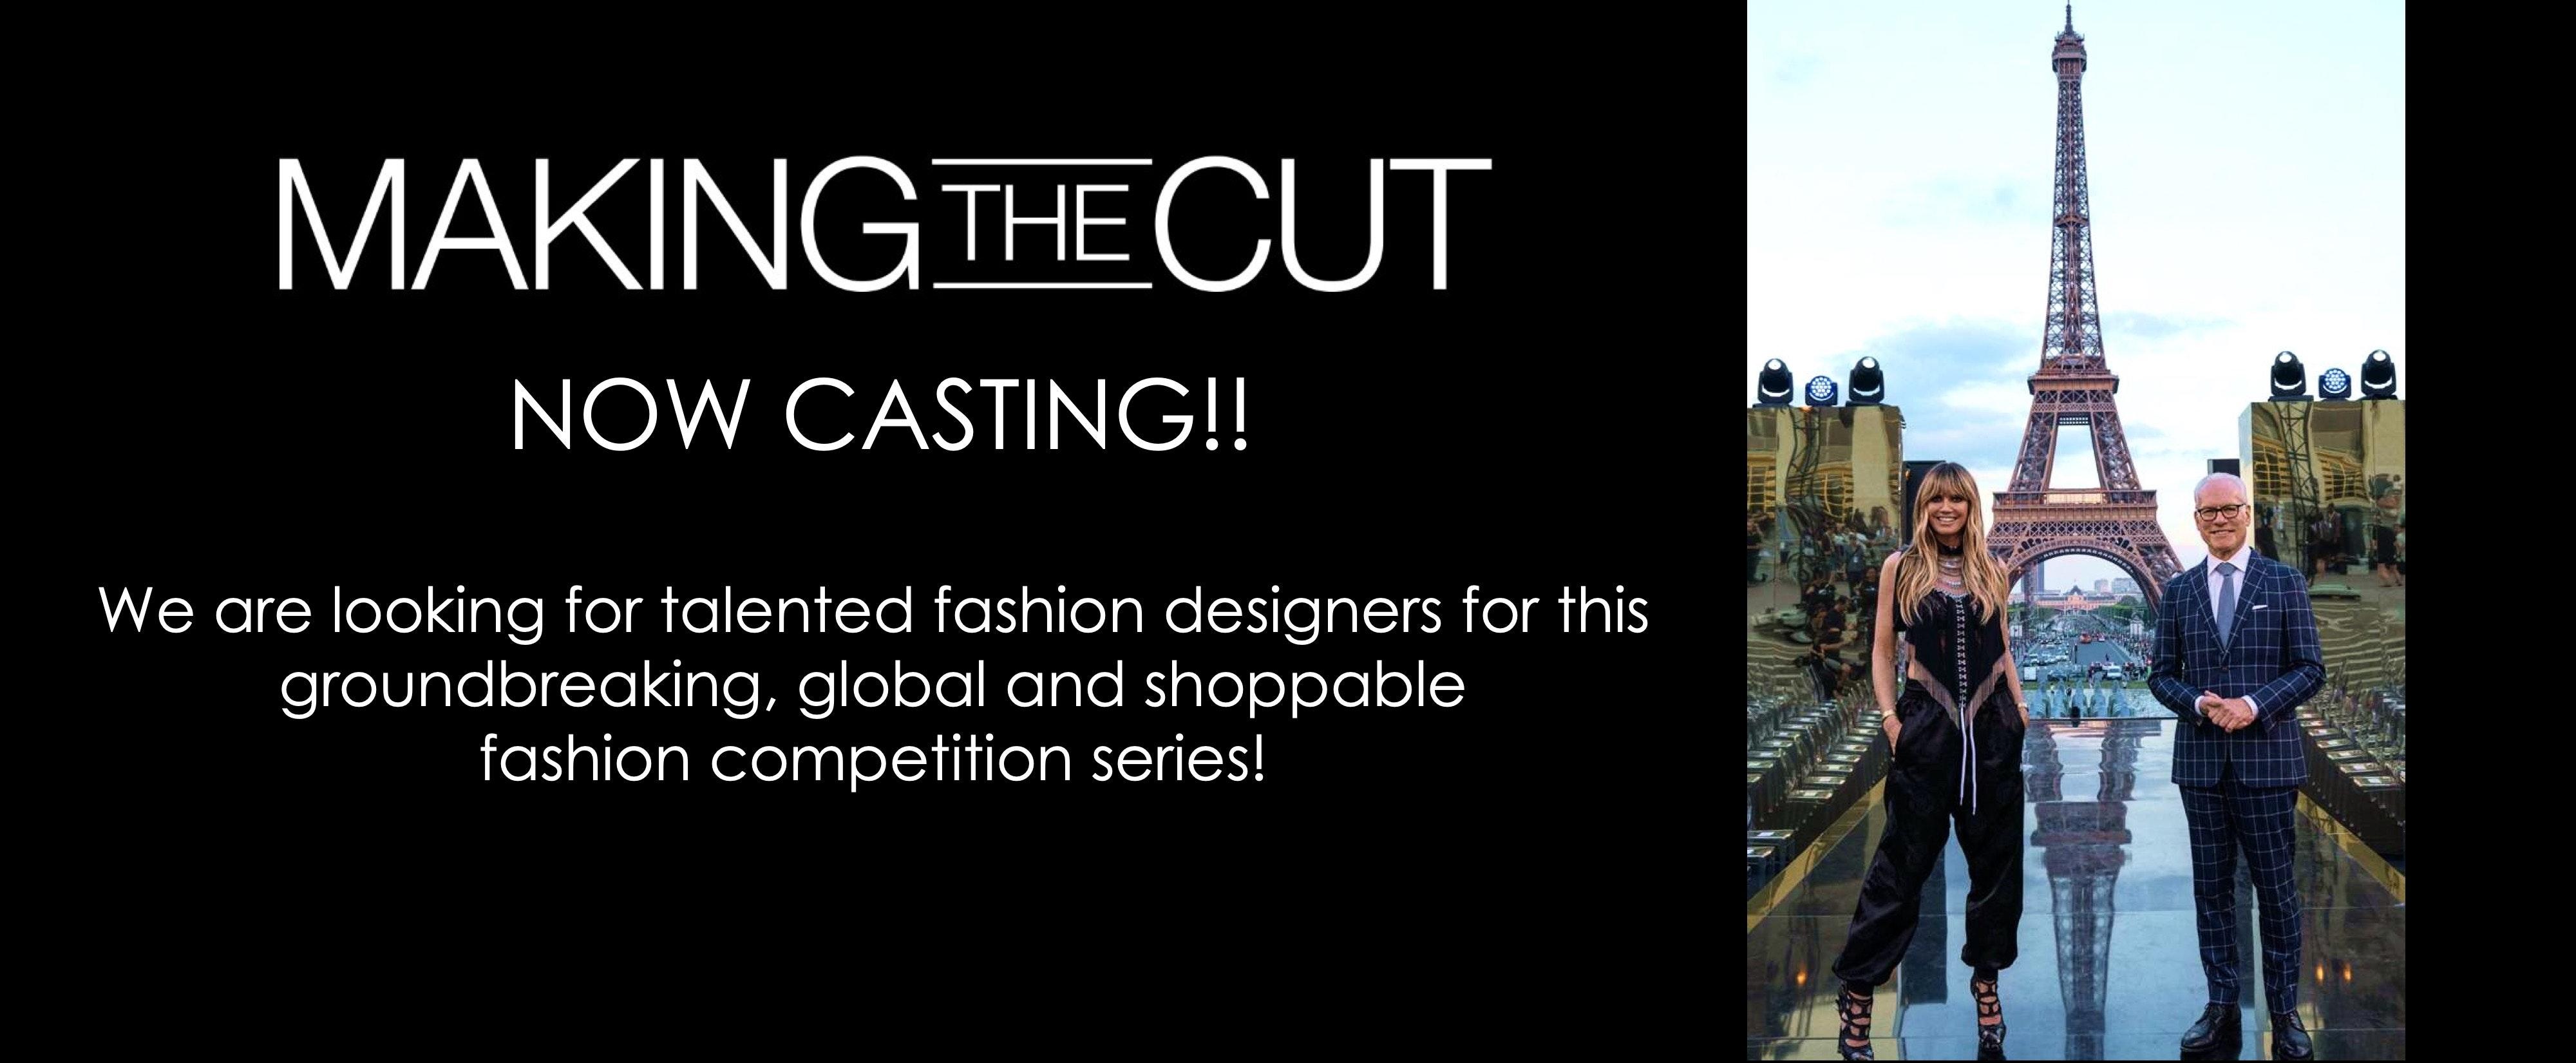 Casting Fashion Designers